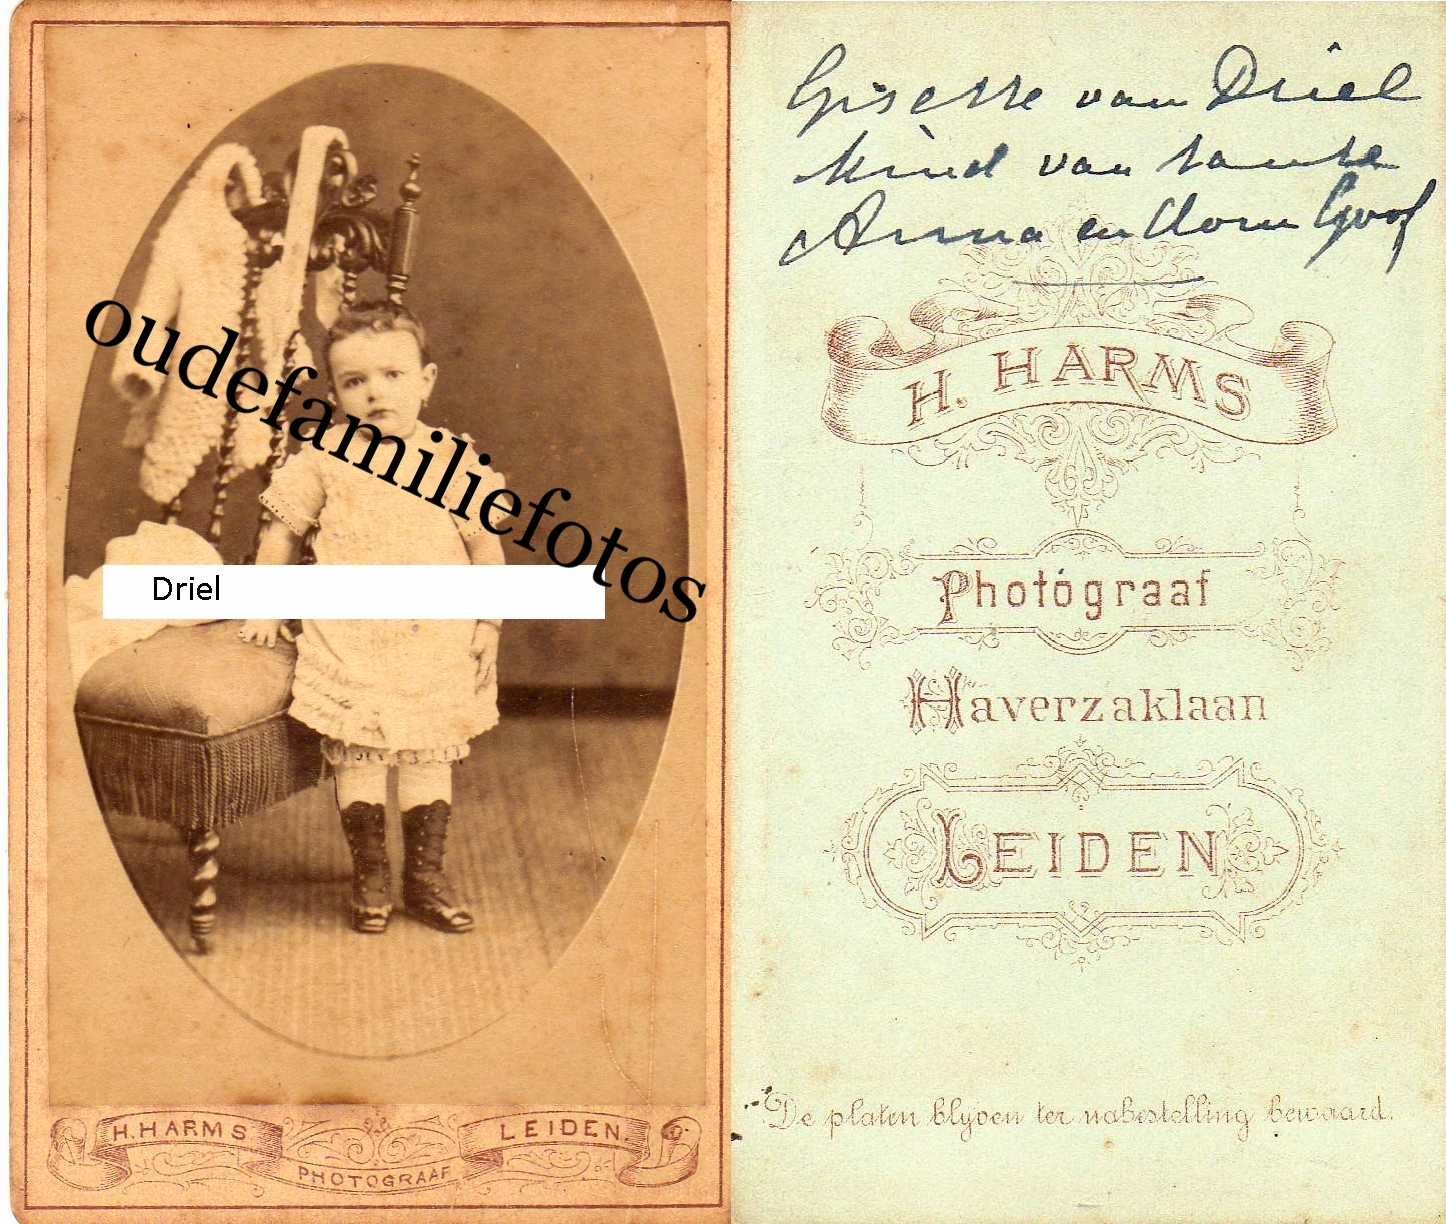 Driel, van, Gisette geb. 29-8-1878 Leiden ovl. 1-1-1883 Leiden Ouders Govert en Anna Maria Segers. € 2,00